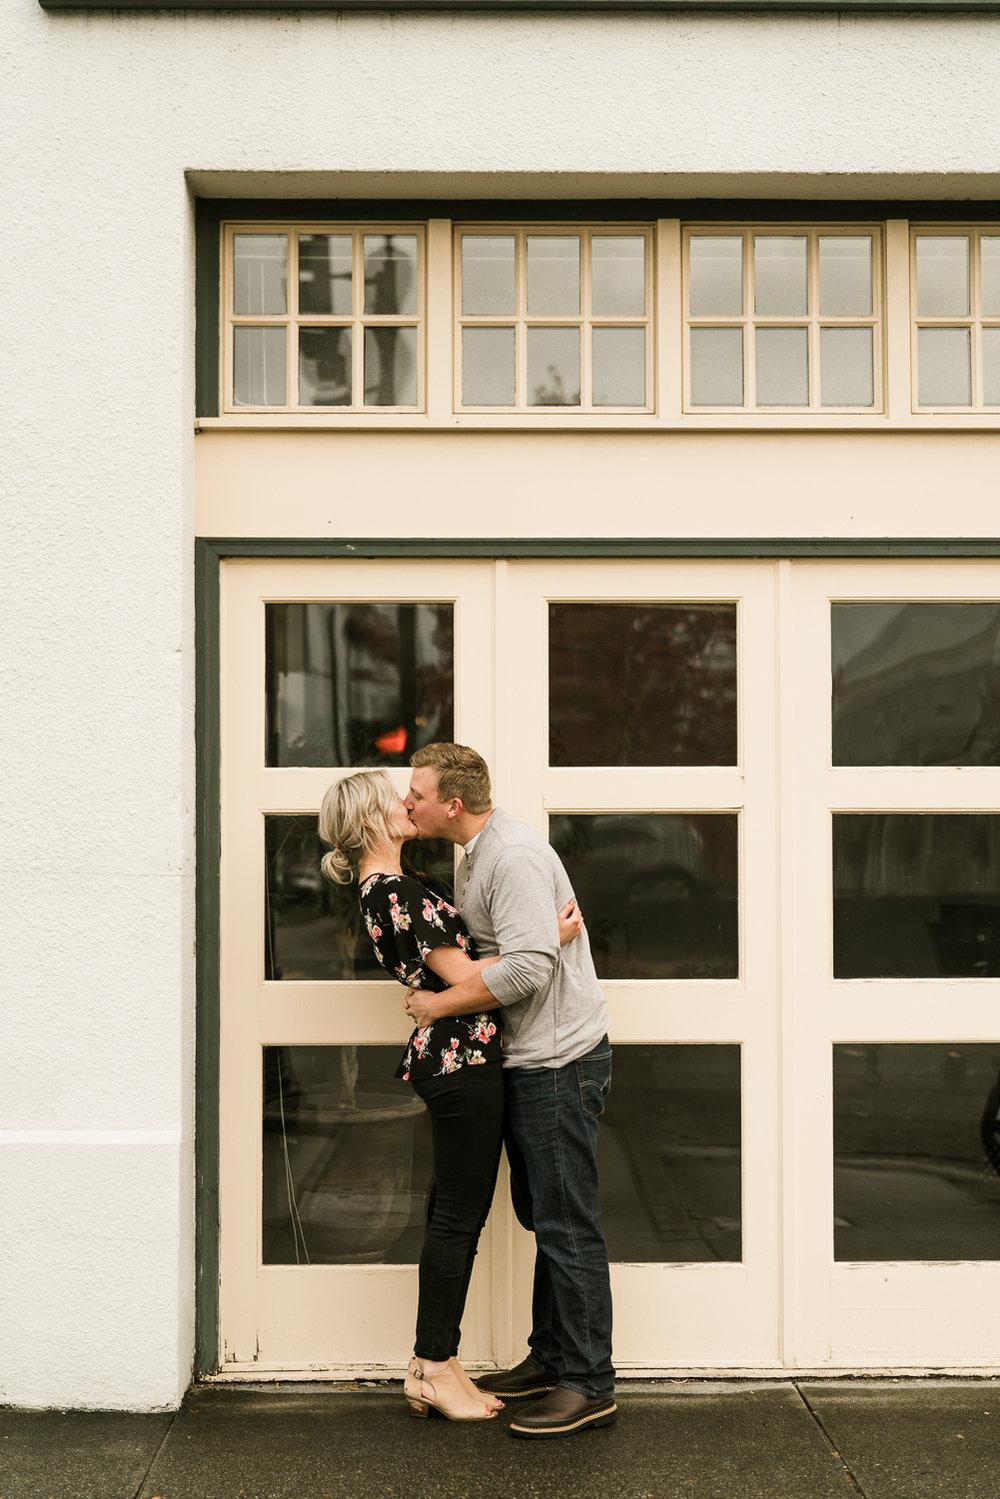 April Yentas Photography - Grace & Christian-11.jpg